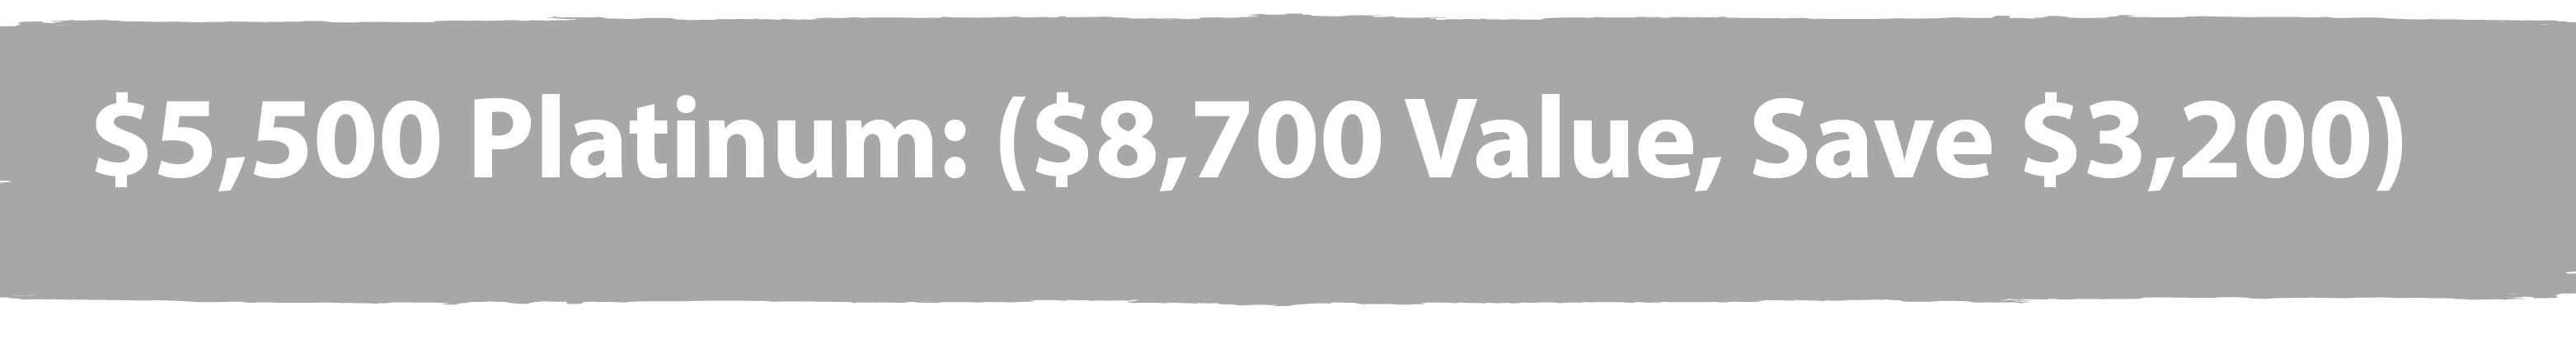 Silver colored banner: $5,500 Platinum: ($8,700 Value)